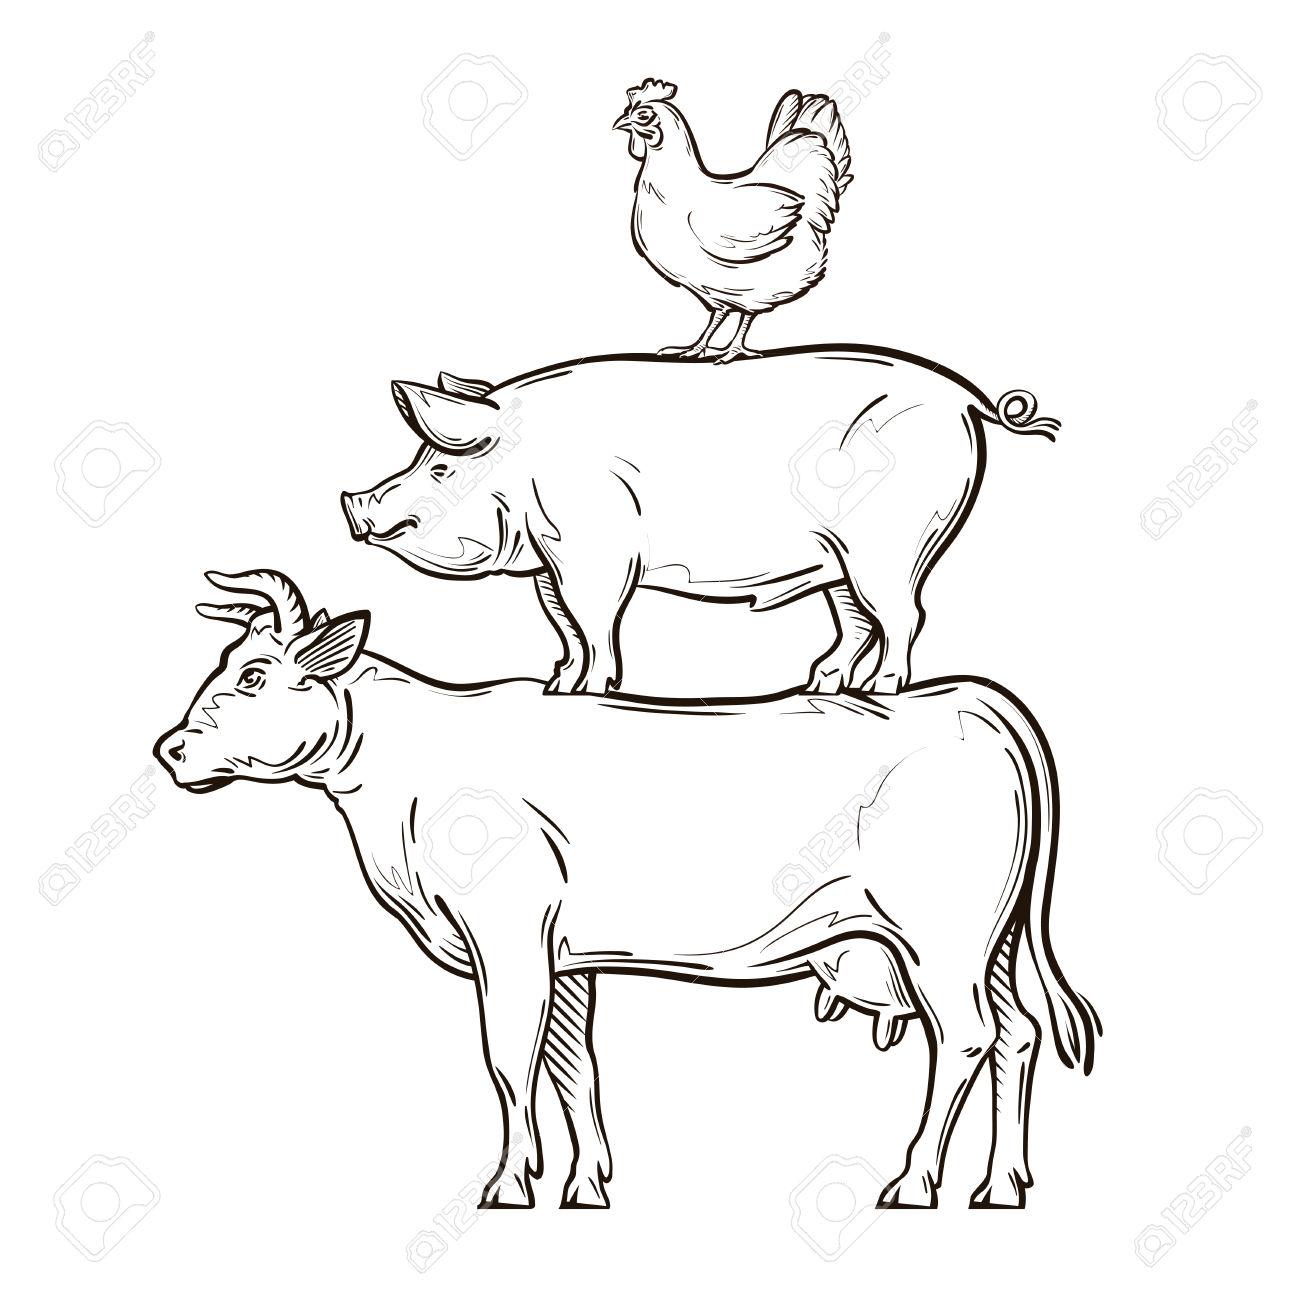 1300x1300 Drawn Cow Line Art